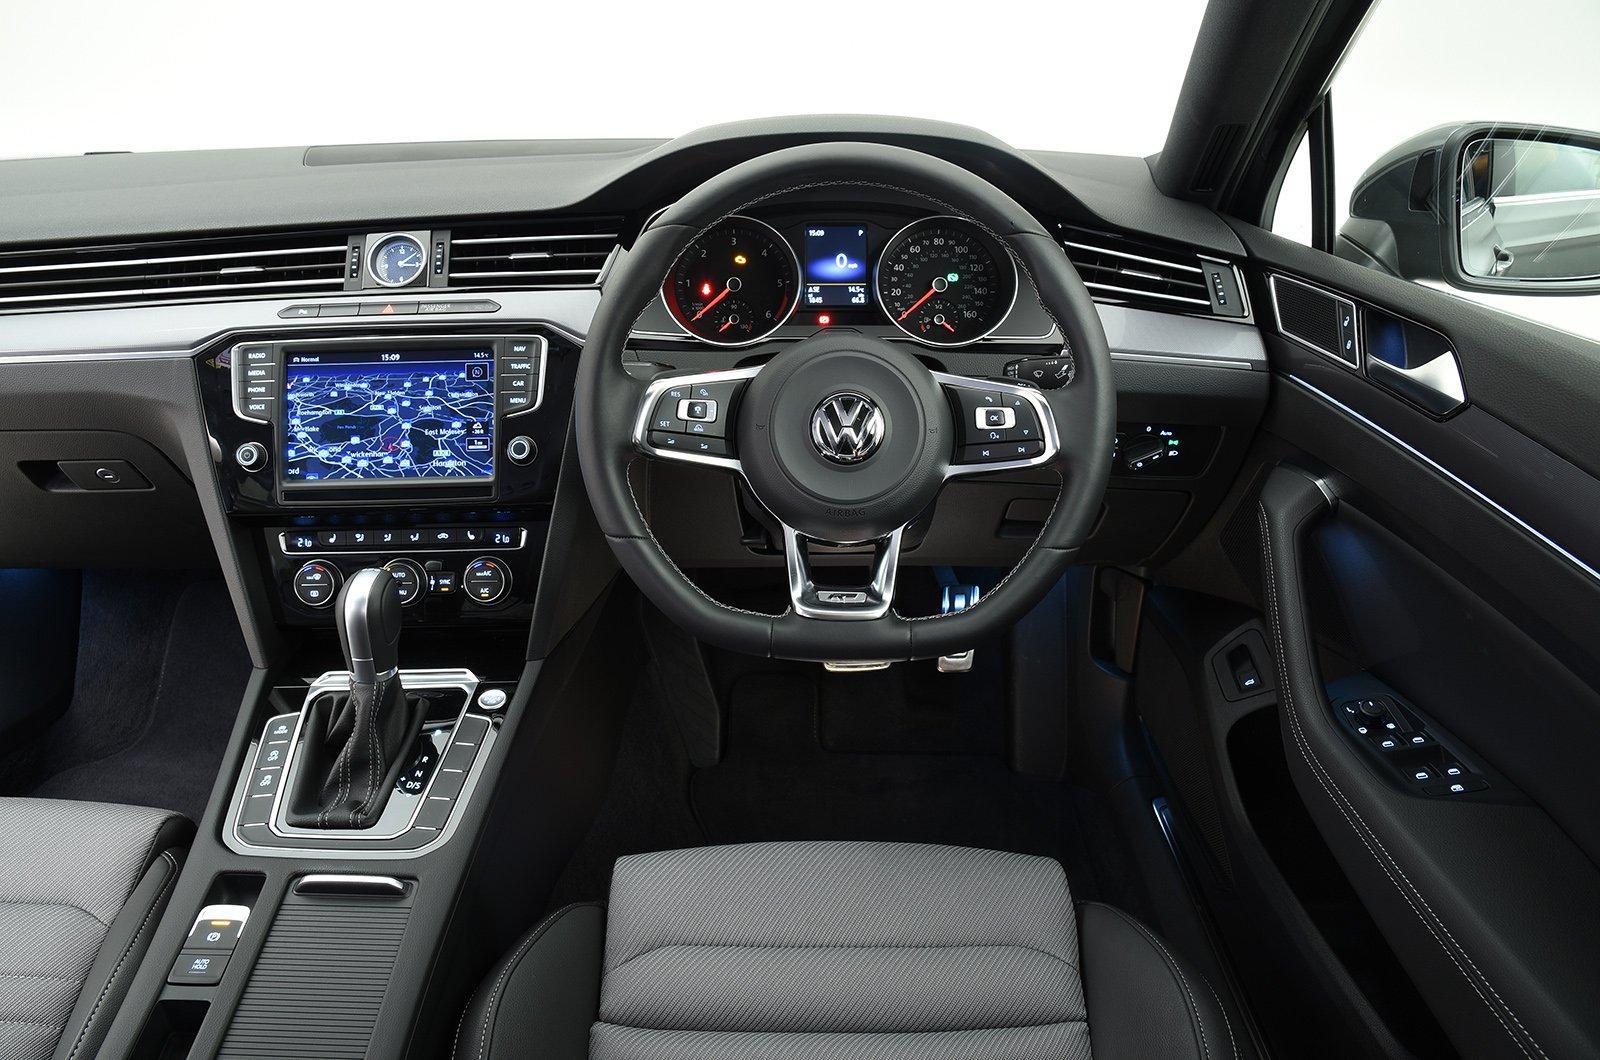 VW Passat 15-present interior